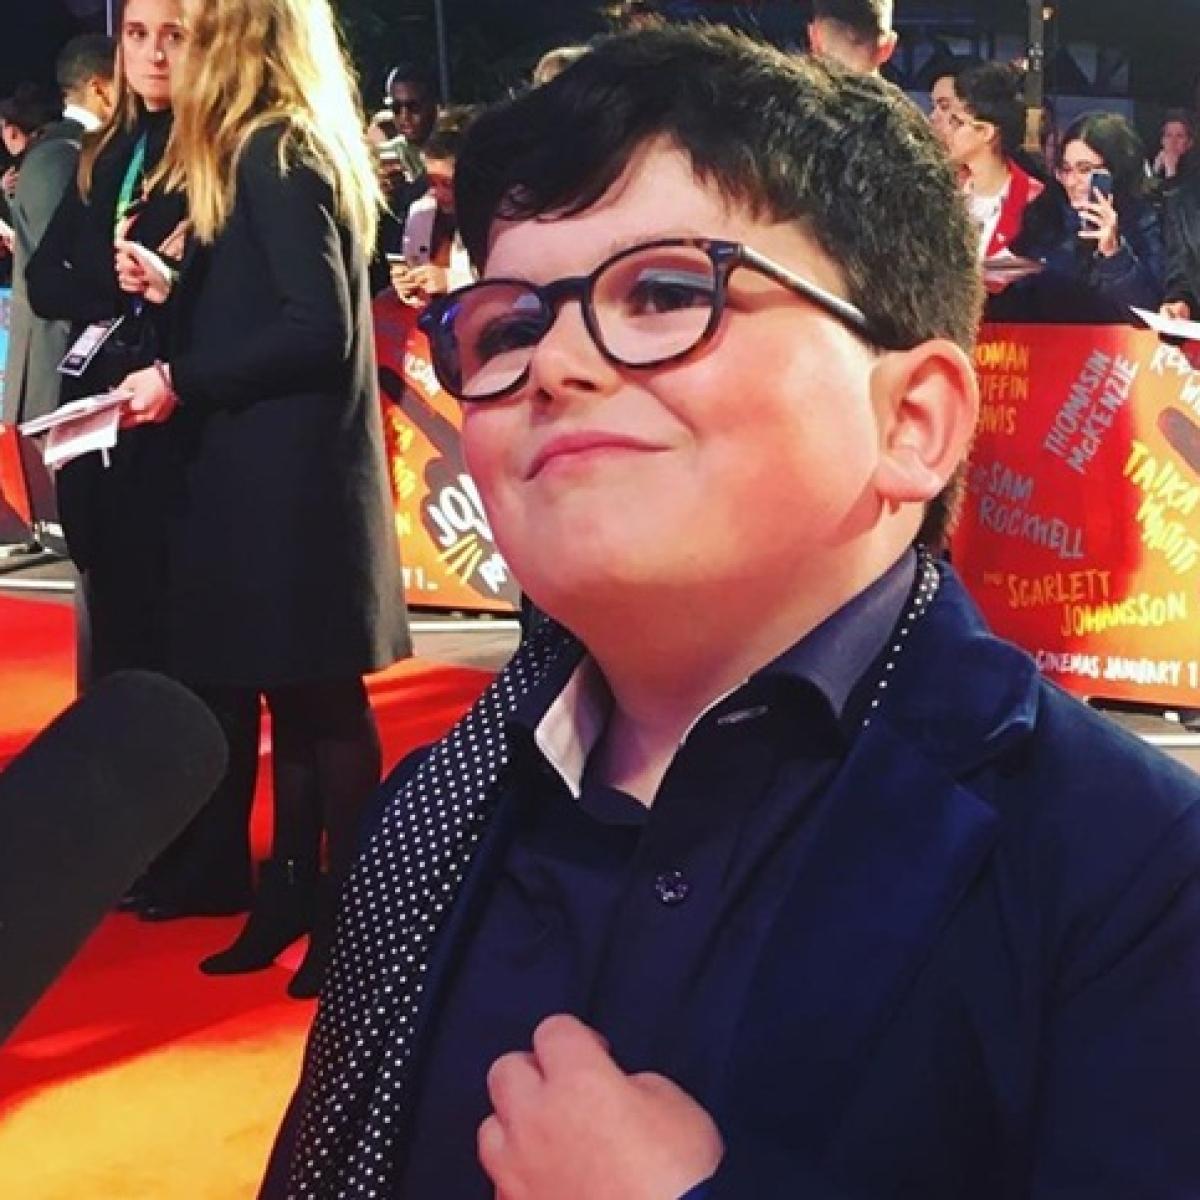 'Jojo Rabbit' child actor Archie Yates to star in 'Home Alone' reboot